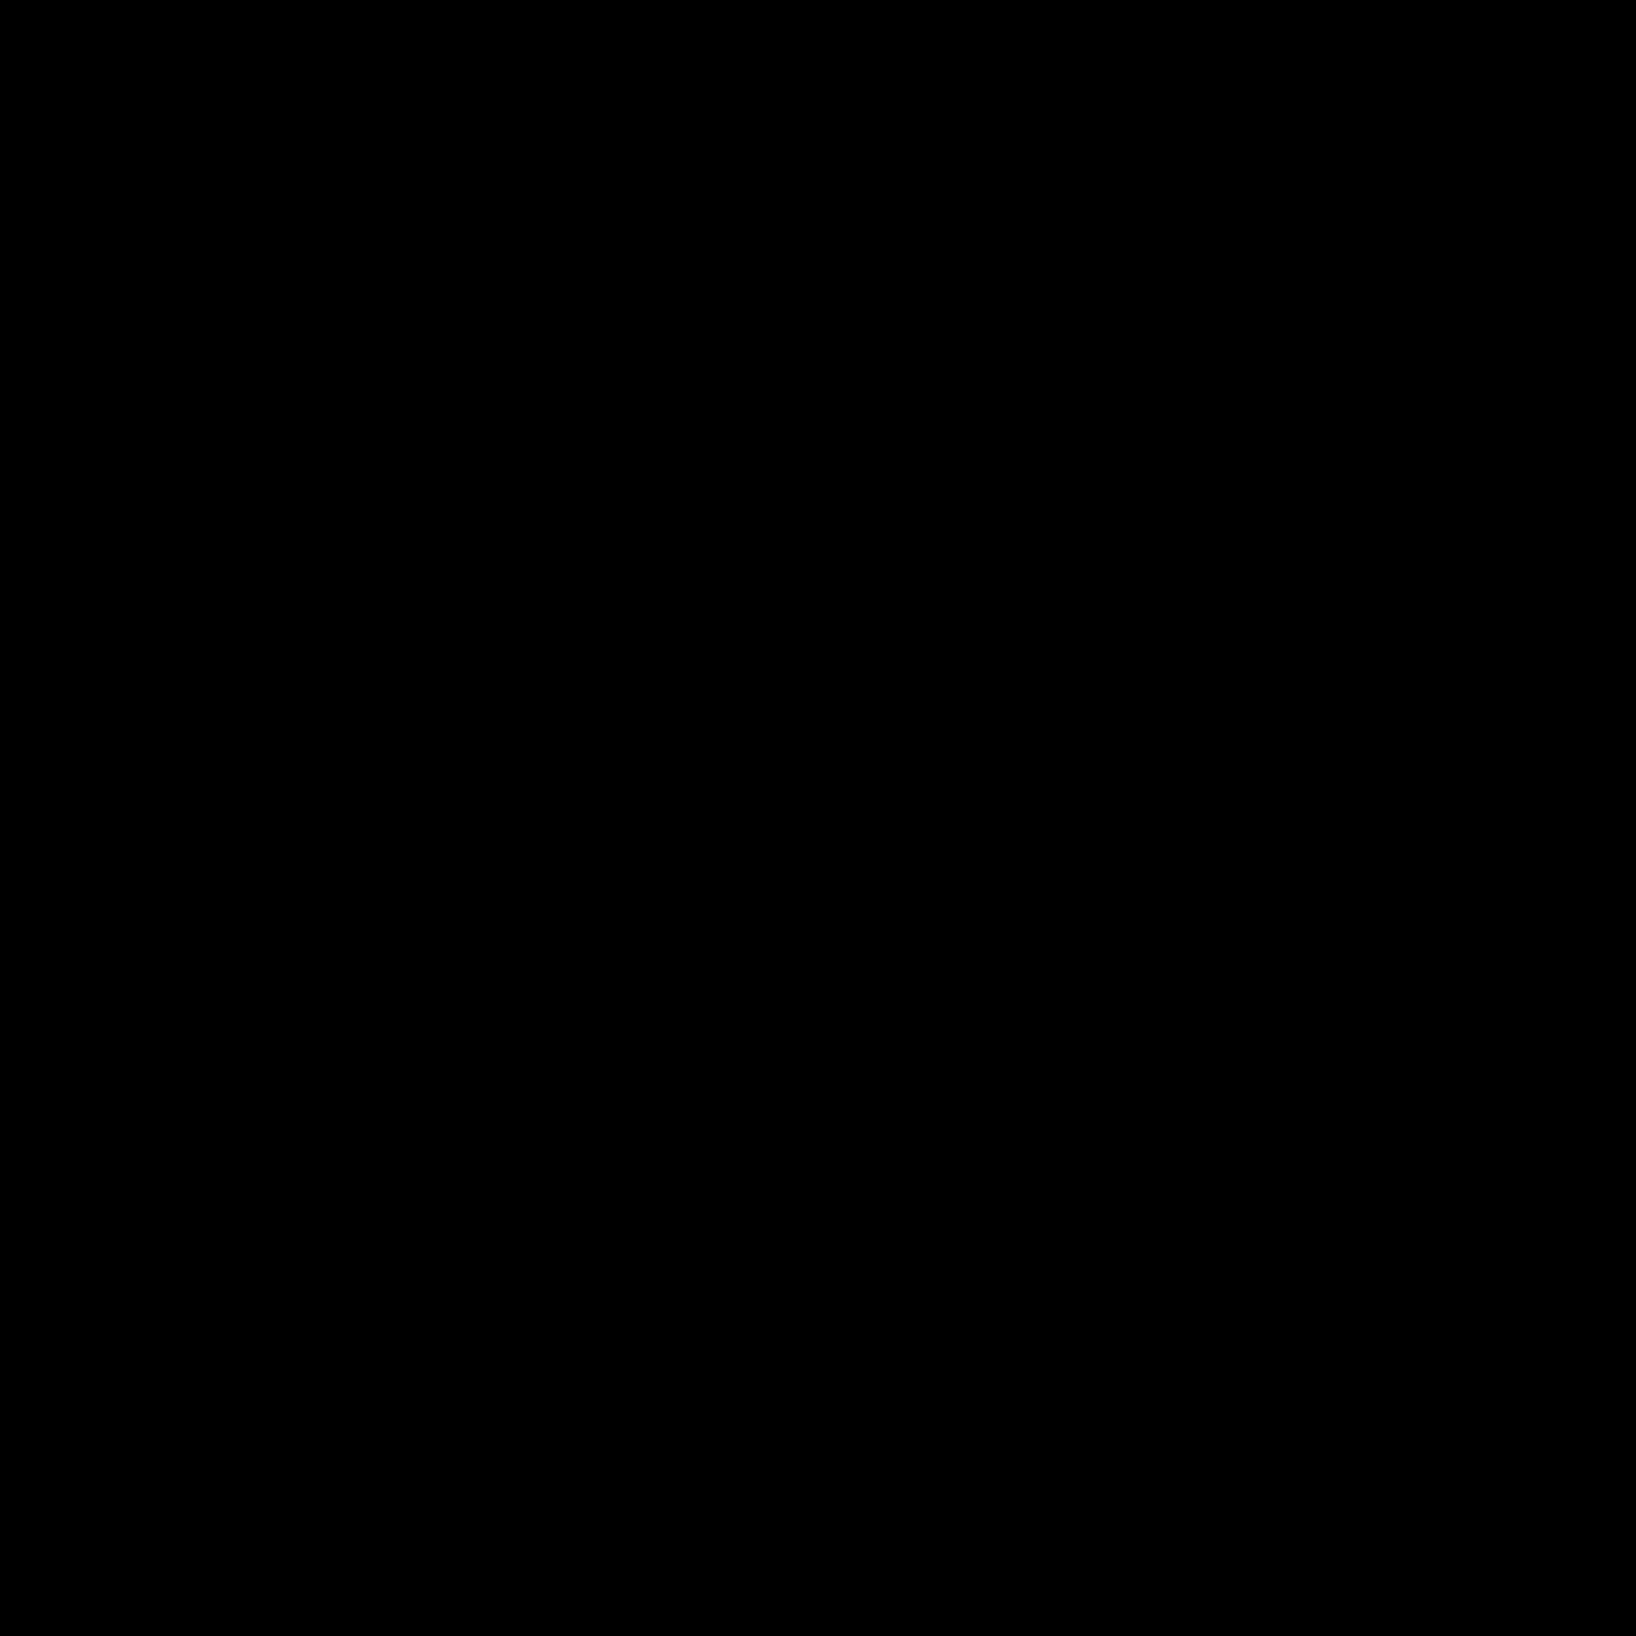 QD-Endplatte für AR15